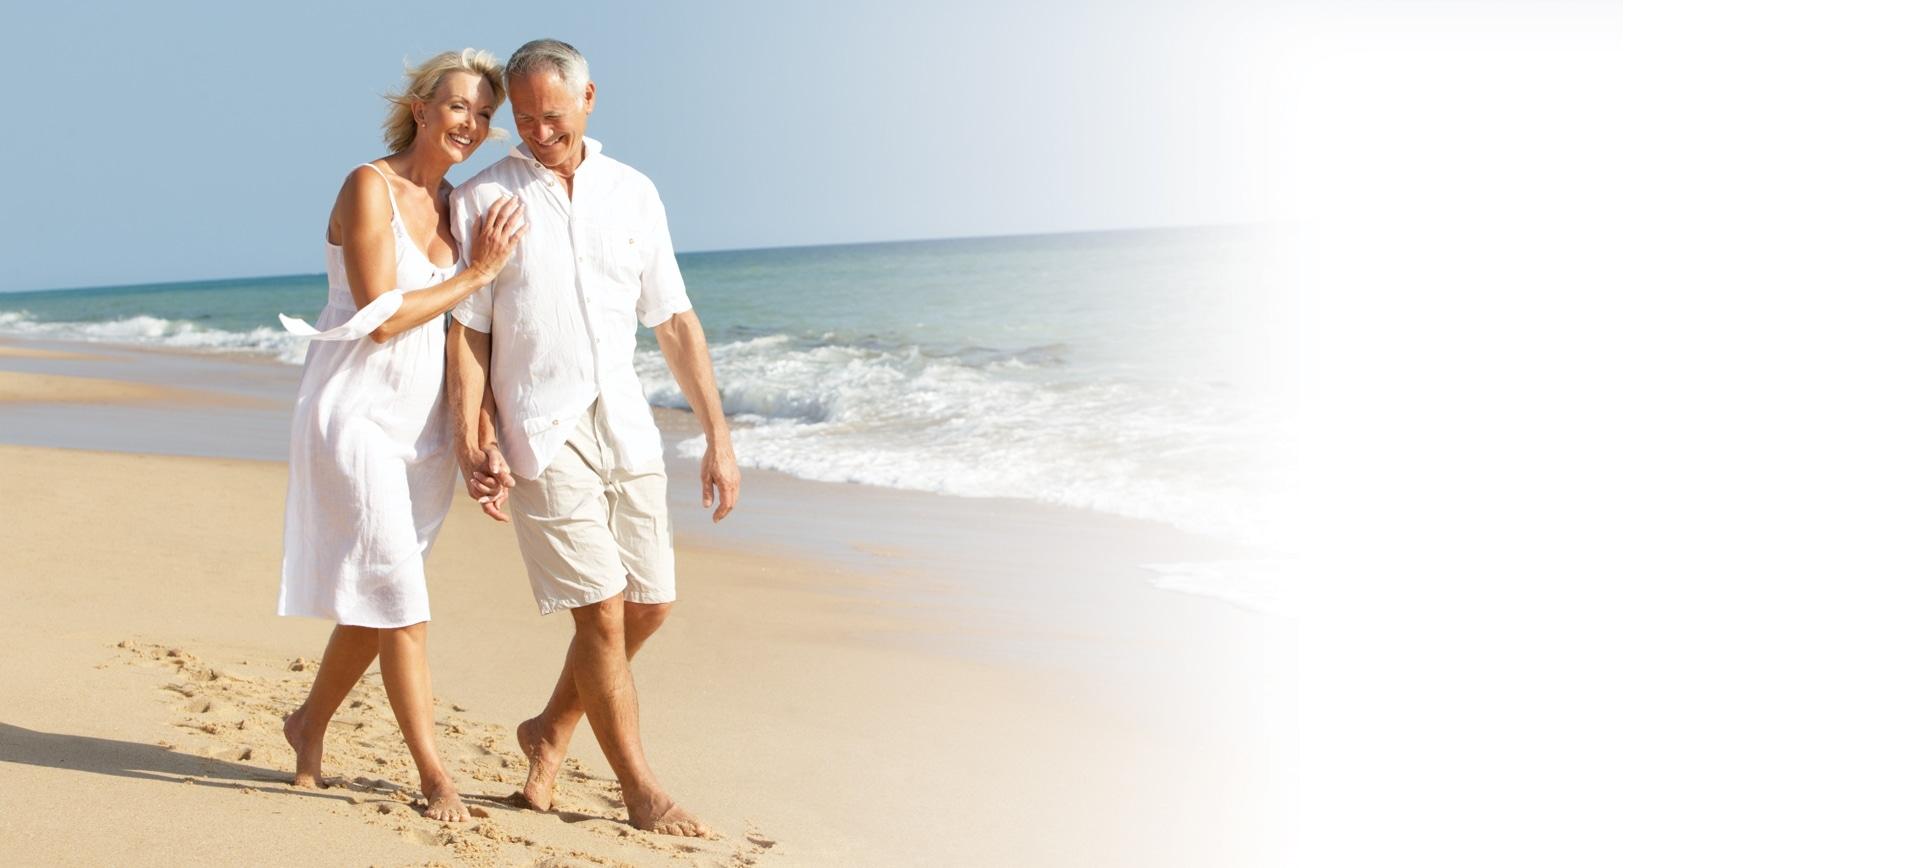 Old people on beach